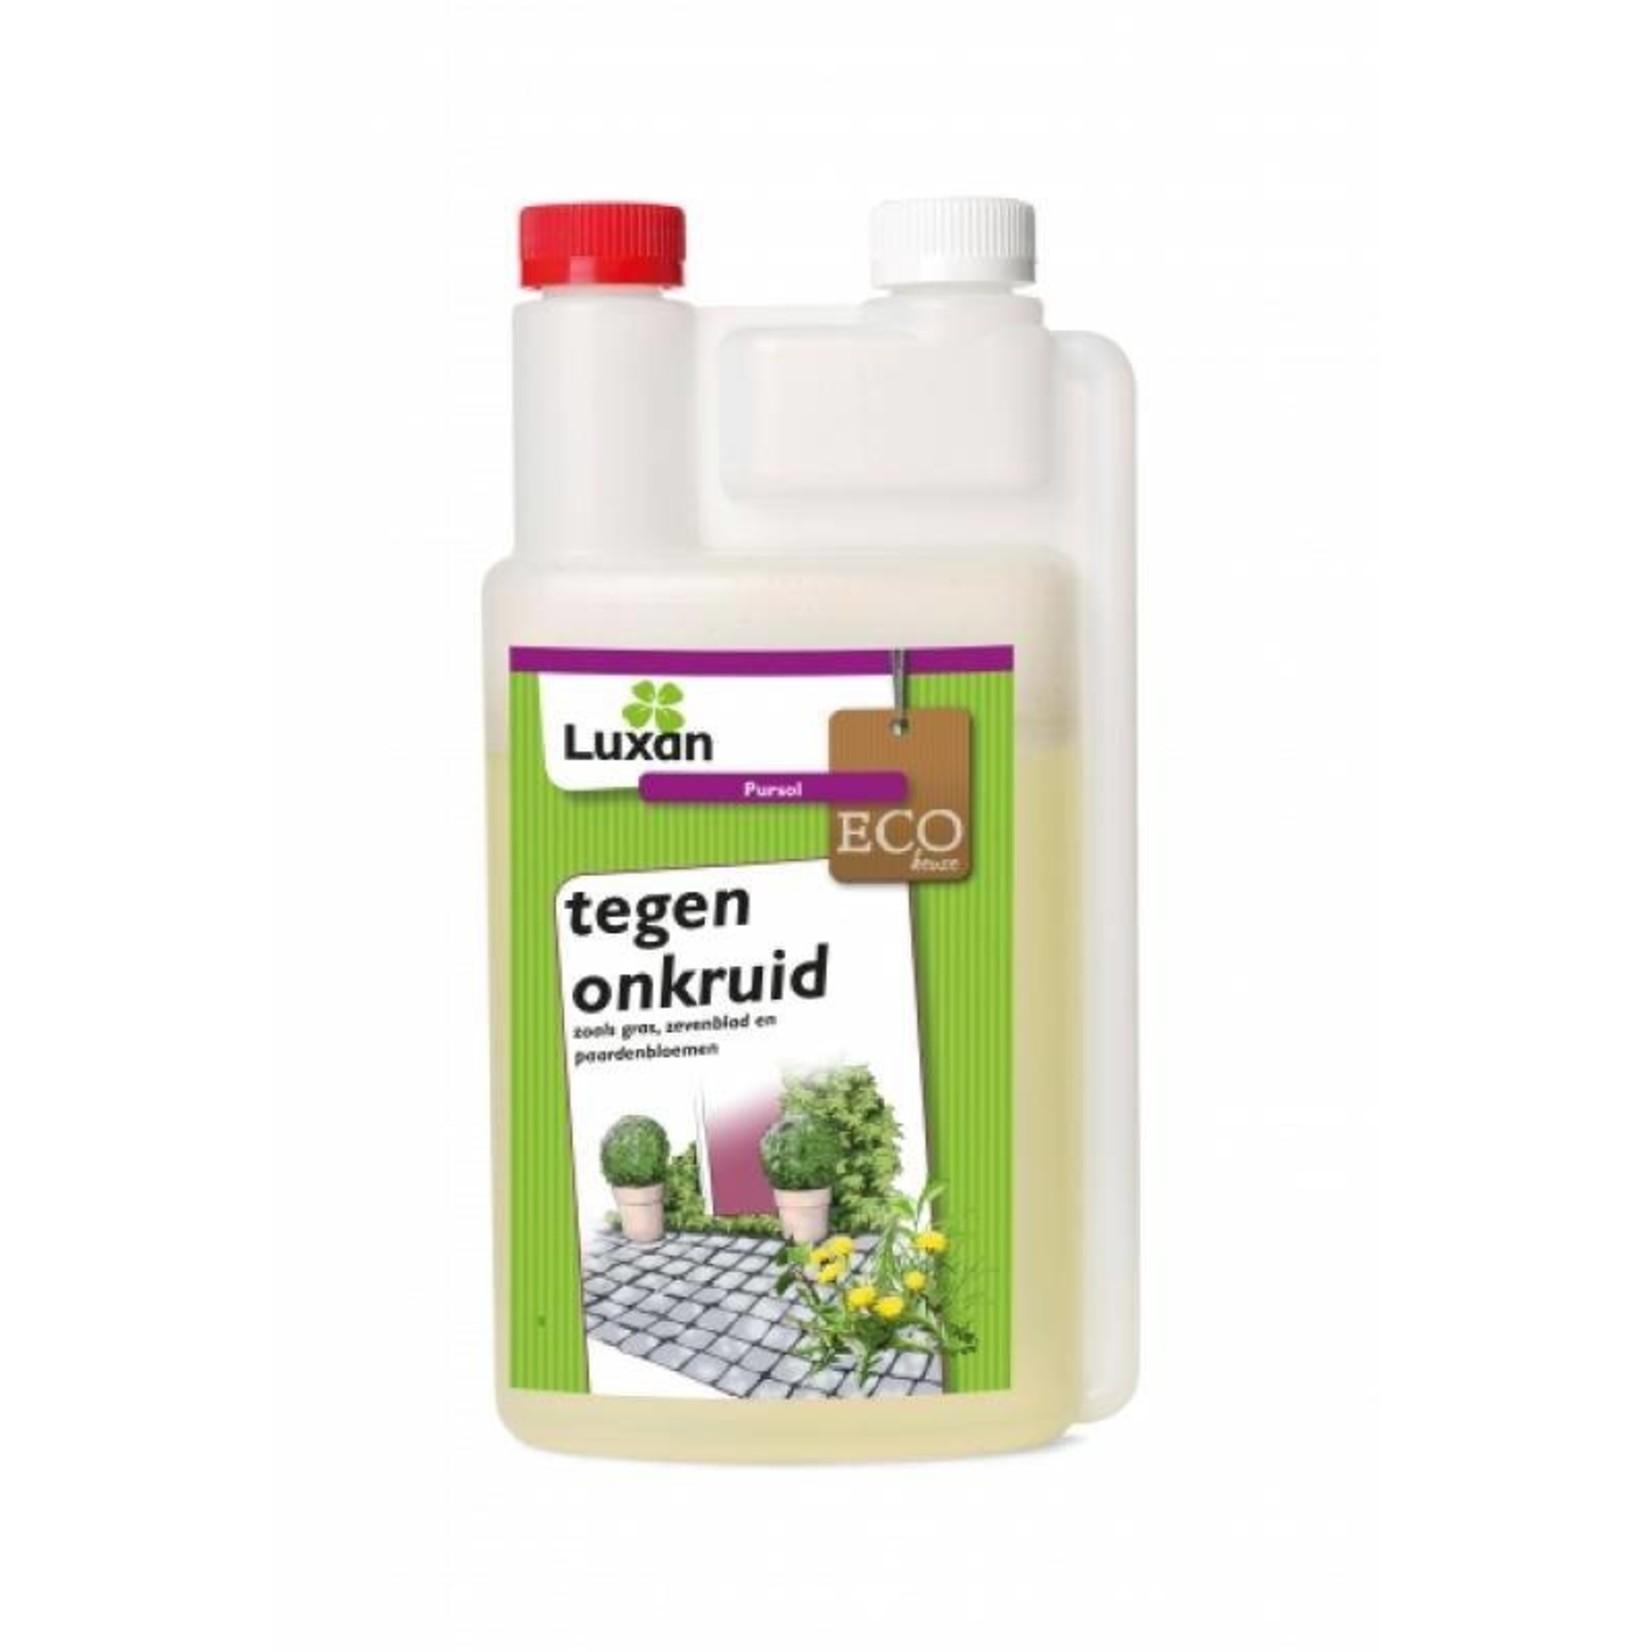 Luxan Pursol tegen onkruid op tegels 1000 ml (concentraat)